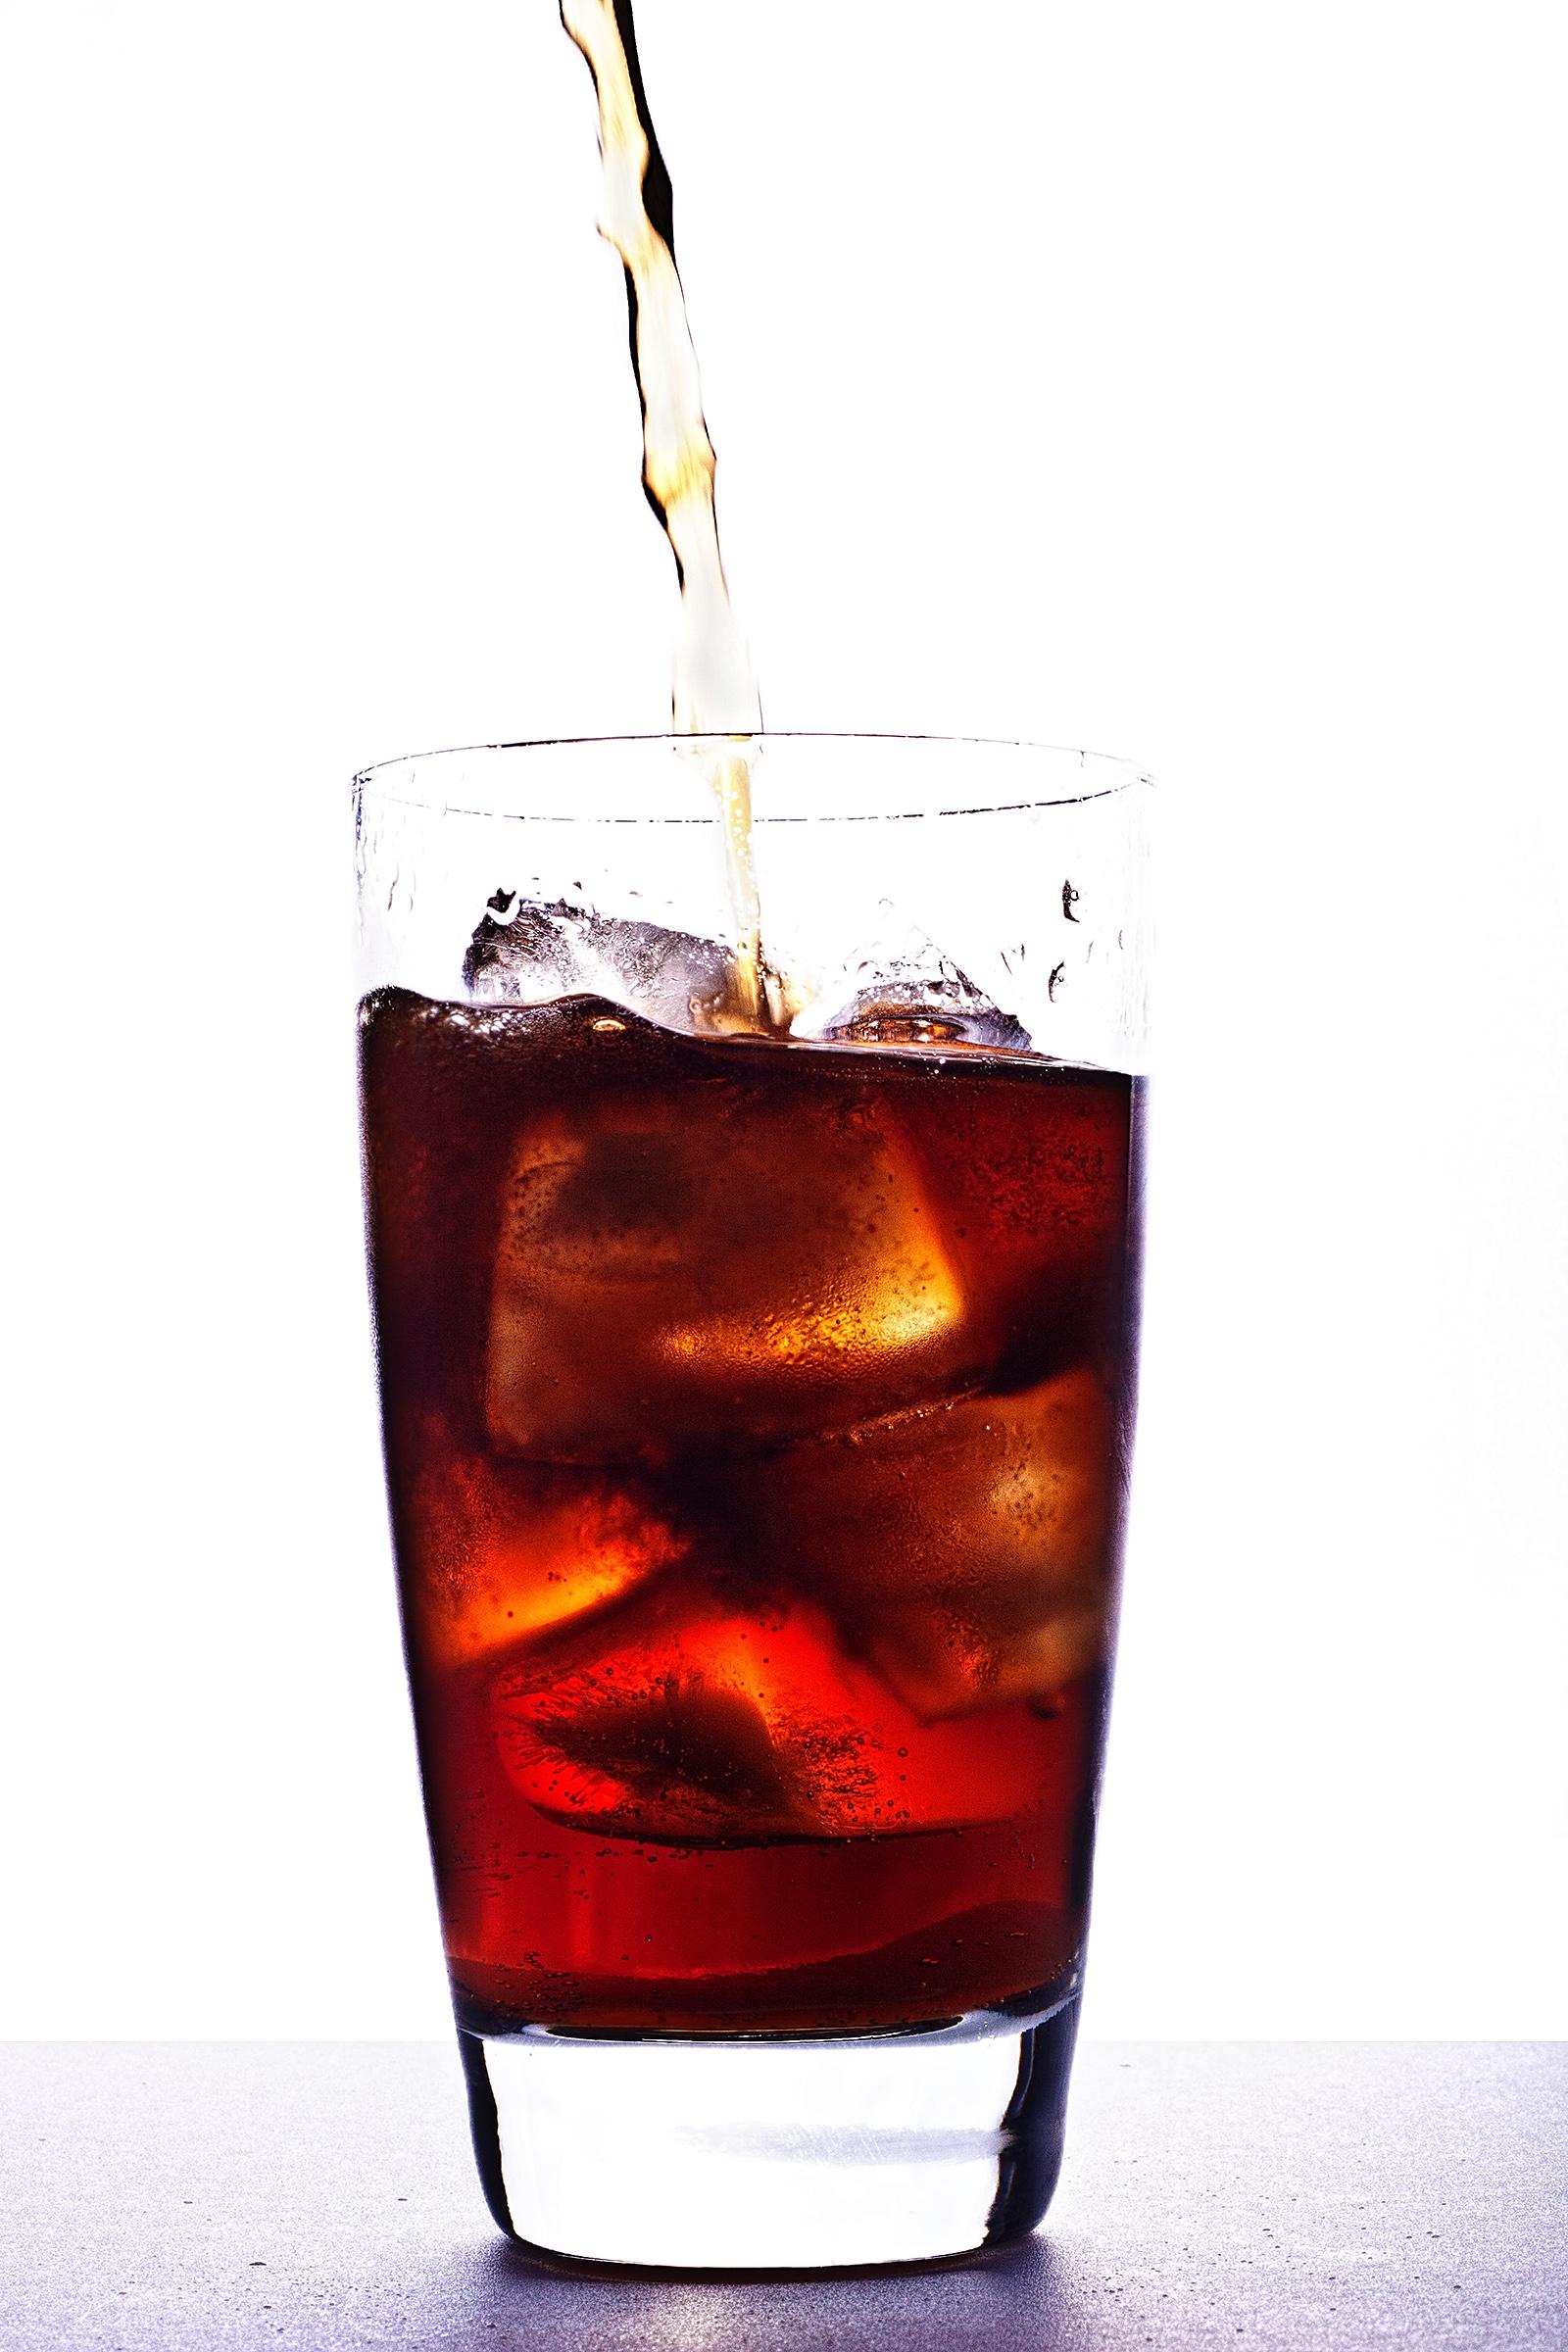 Soda pop photo